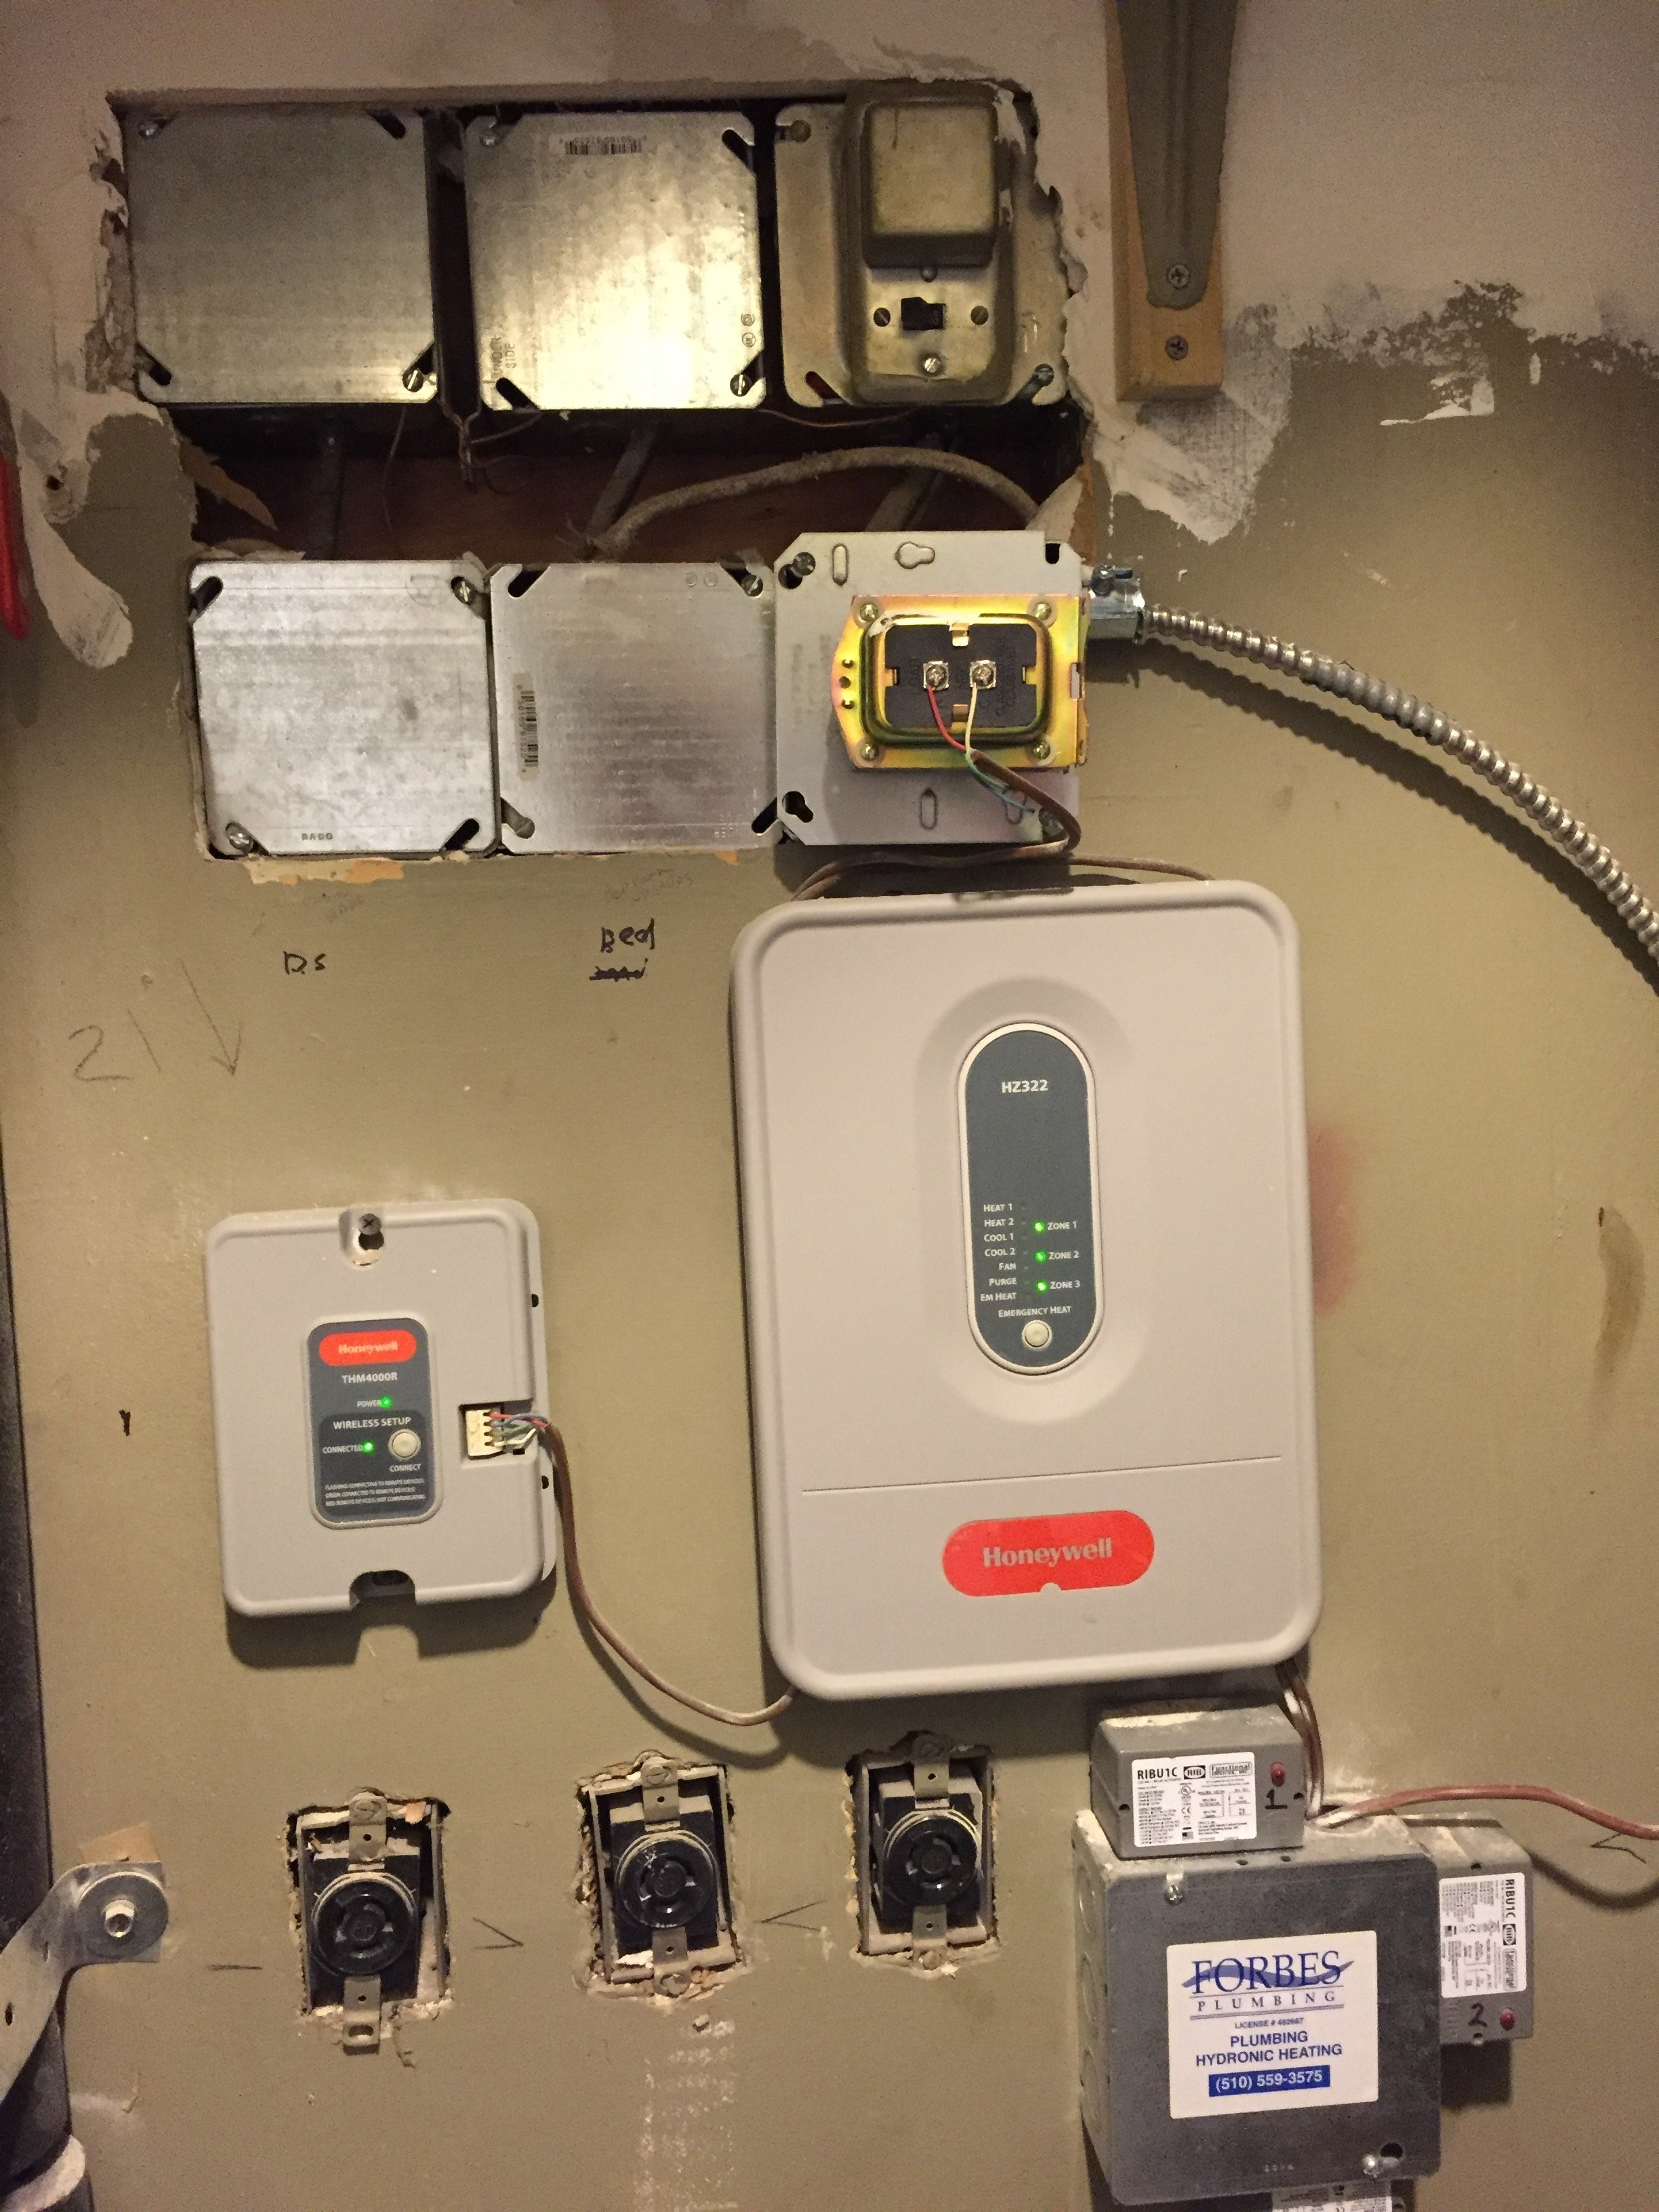 2 Wire Honeywell thermostat Installation Wireless Tstats Honeywell Redlink Experience — Heating Of 2 Wire Honeywell thermostat Installation